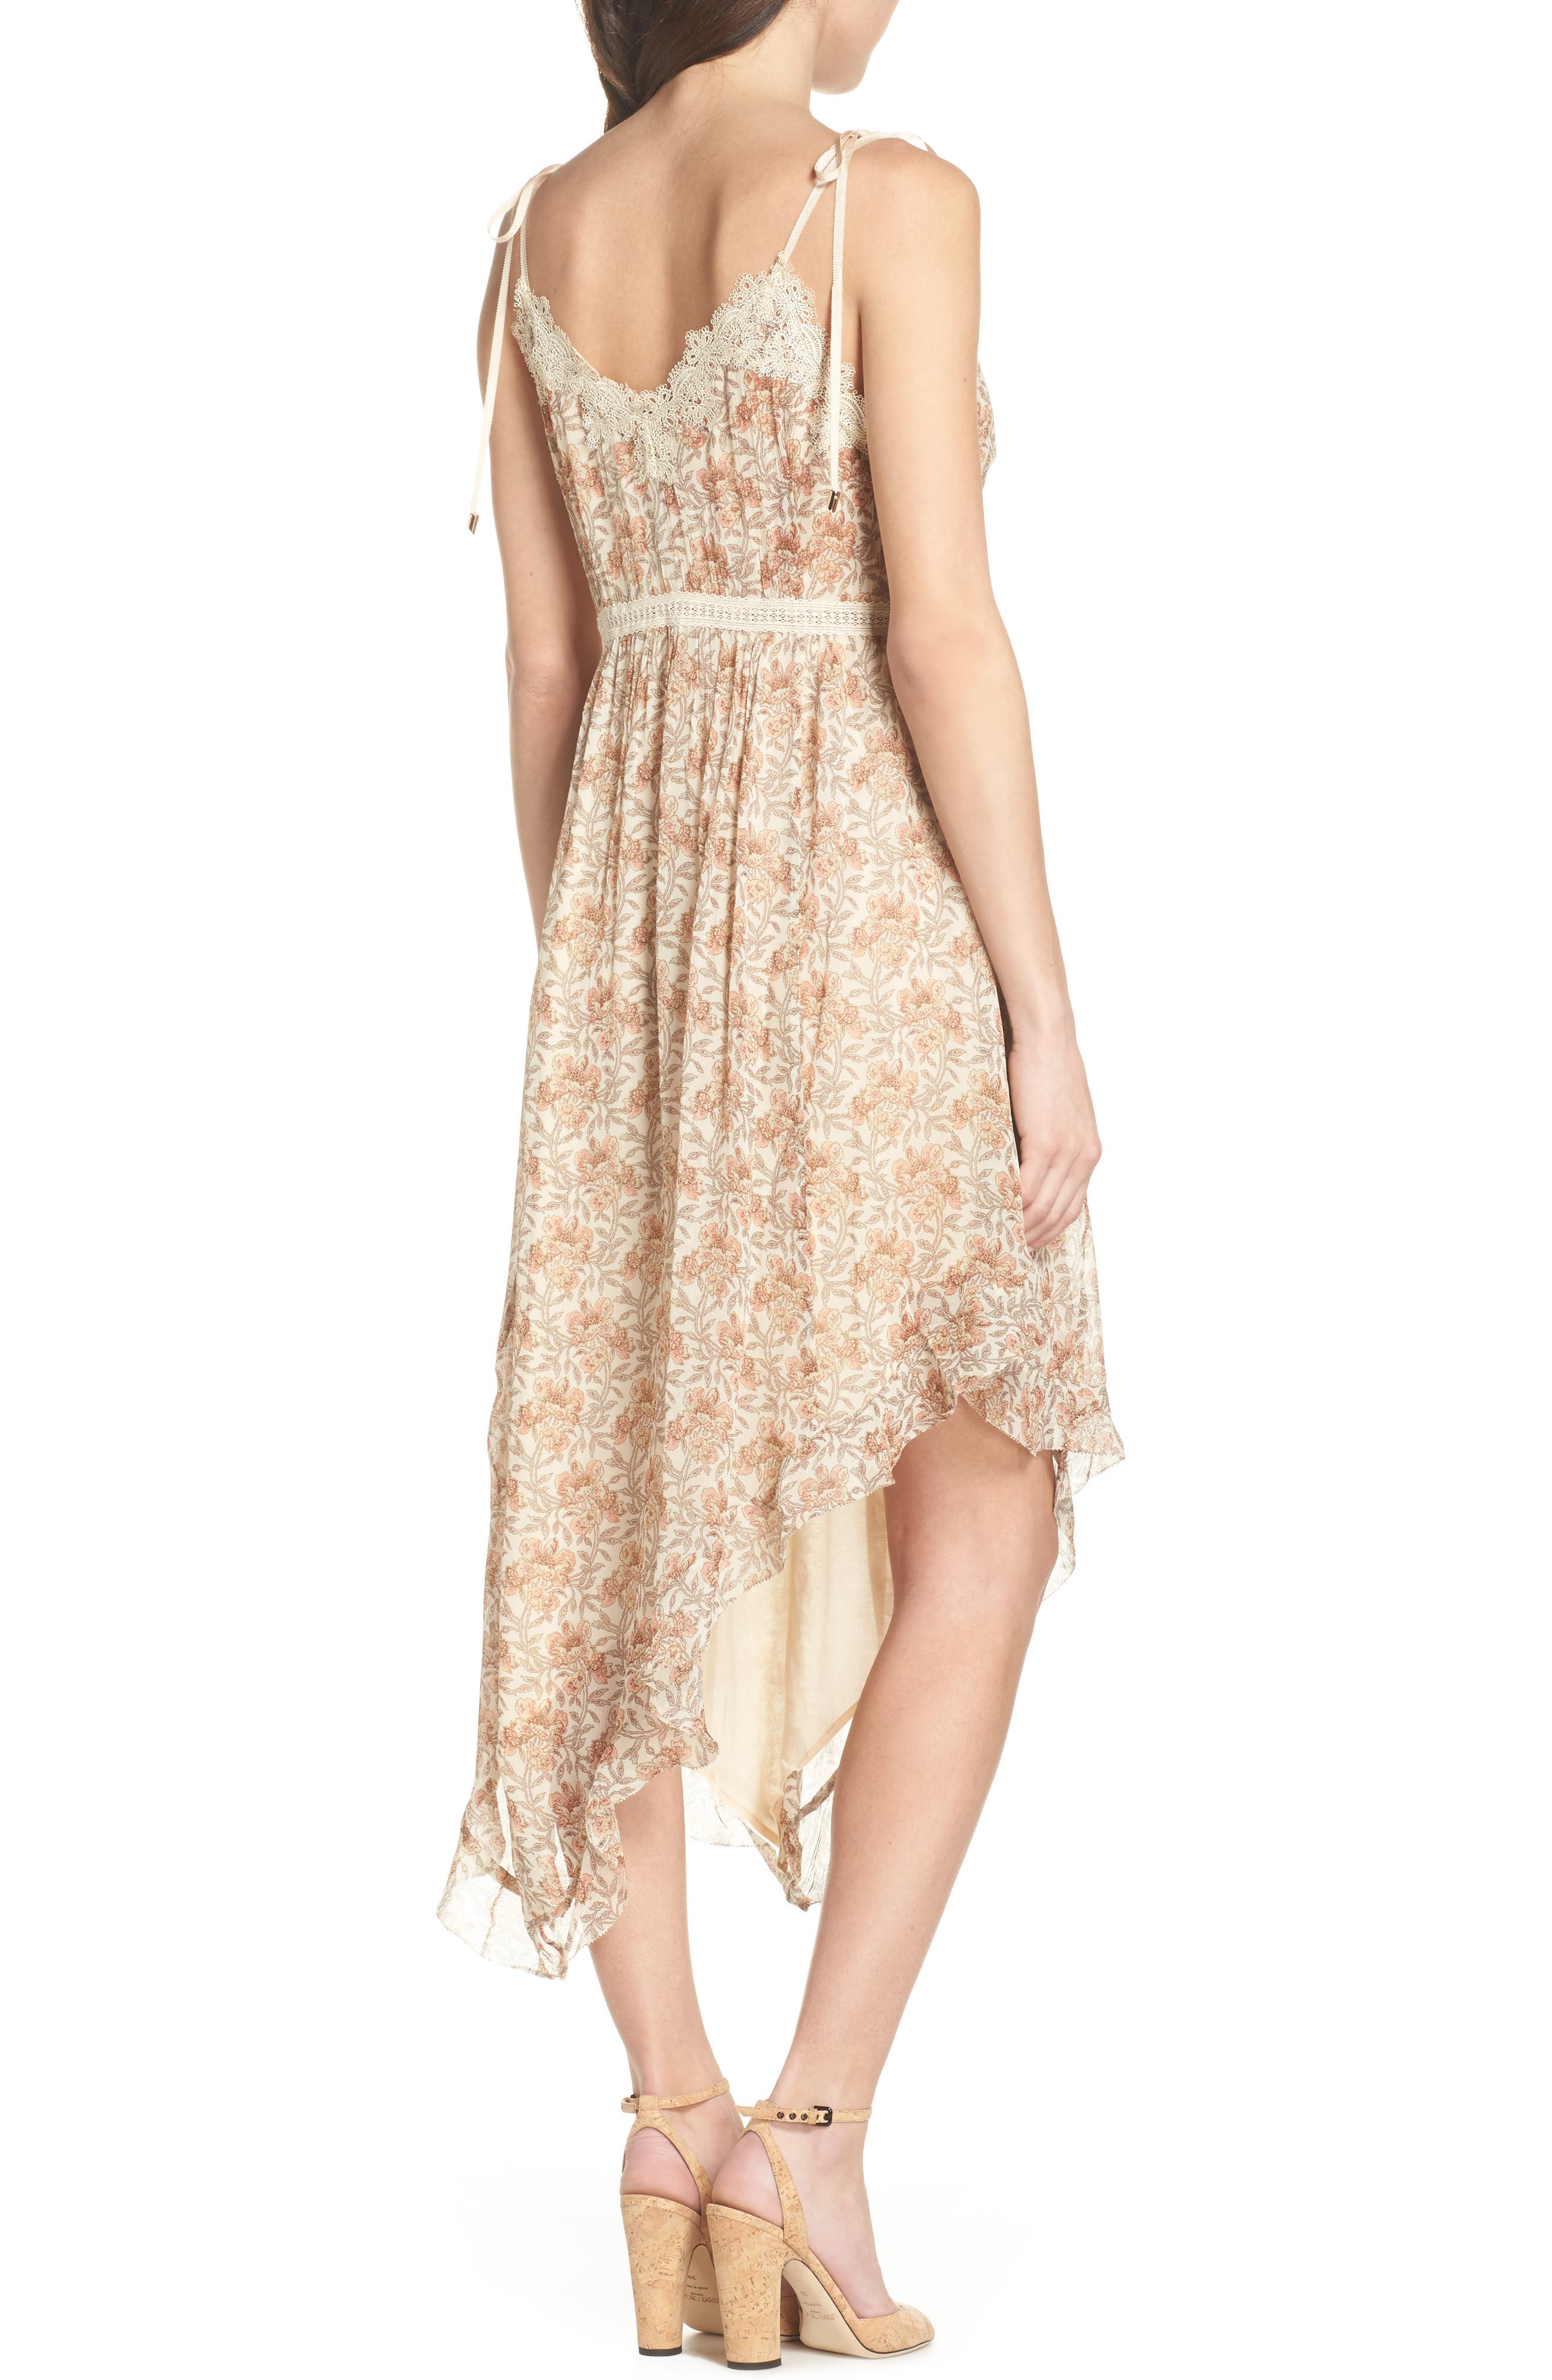 Aubrey Floral Print Dress,                             Alternate thumbnail 2, color,                             Desert Sunrise Floral